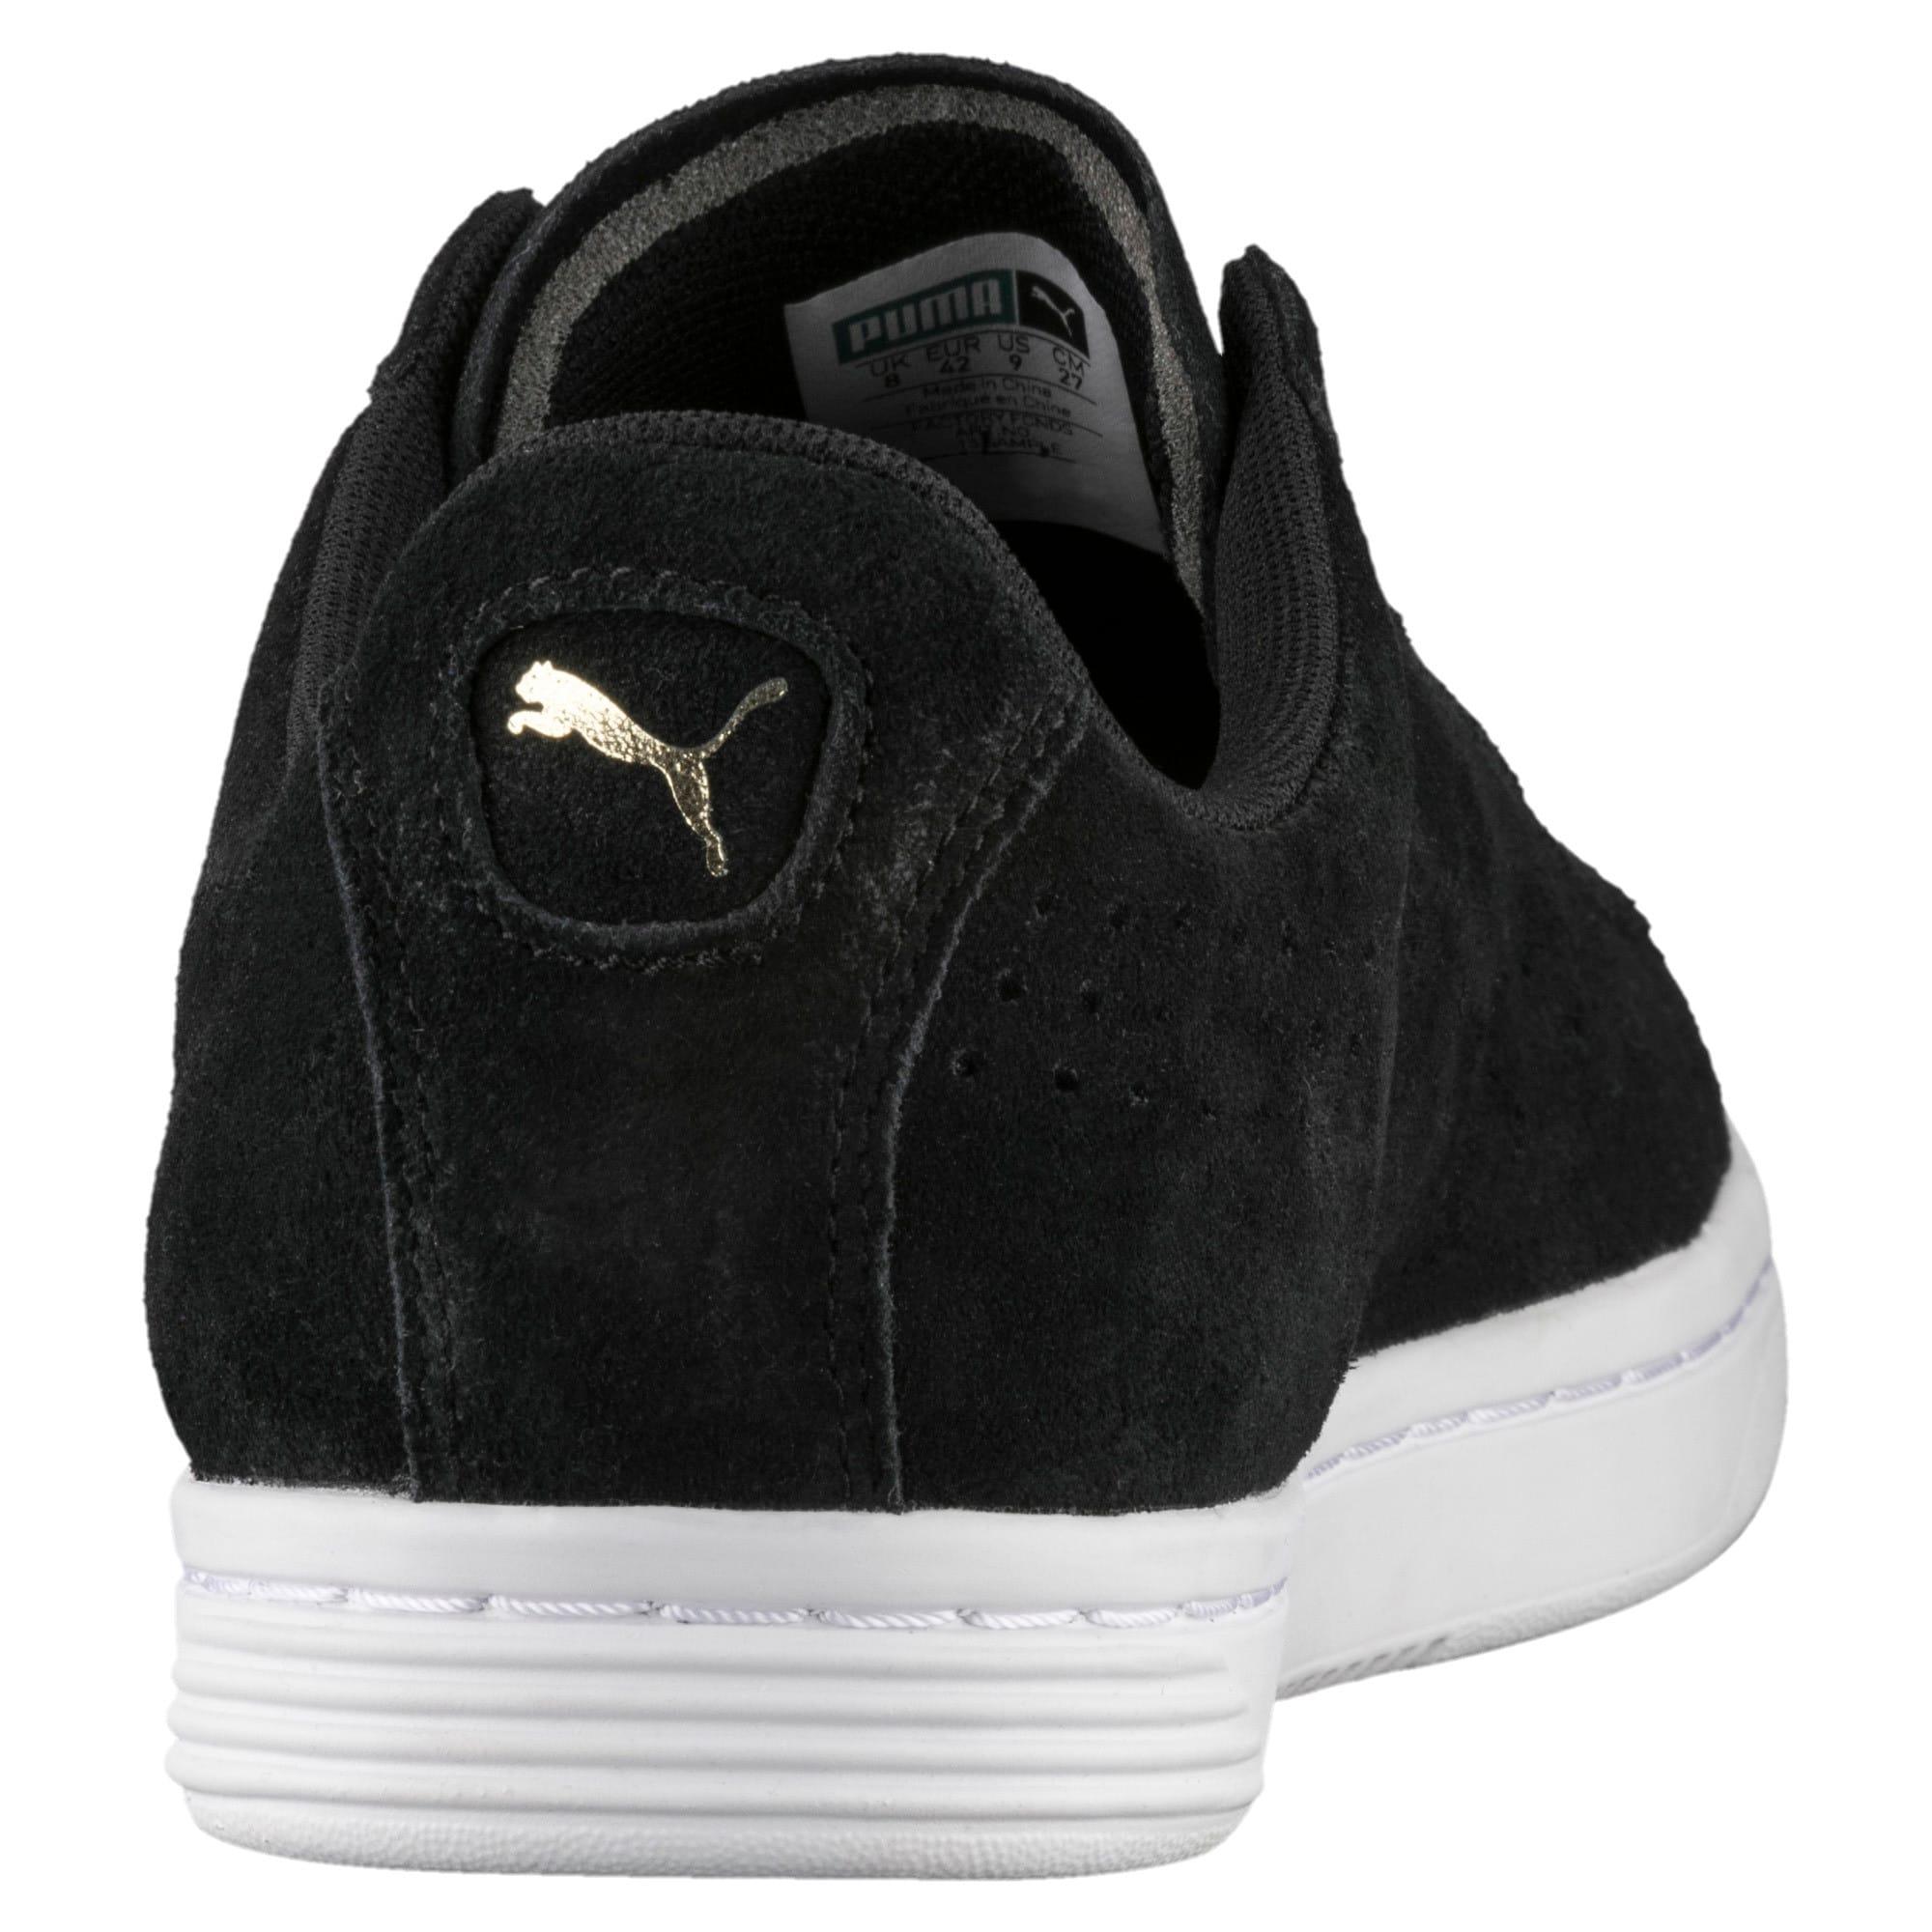 Thumbnail 4 of Court Star Suede Sneakers, Puma Black, medium